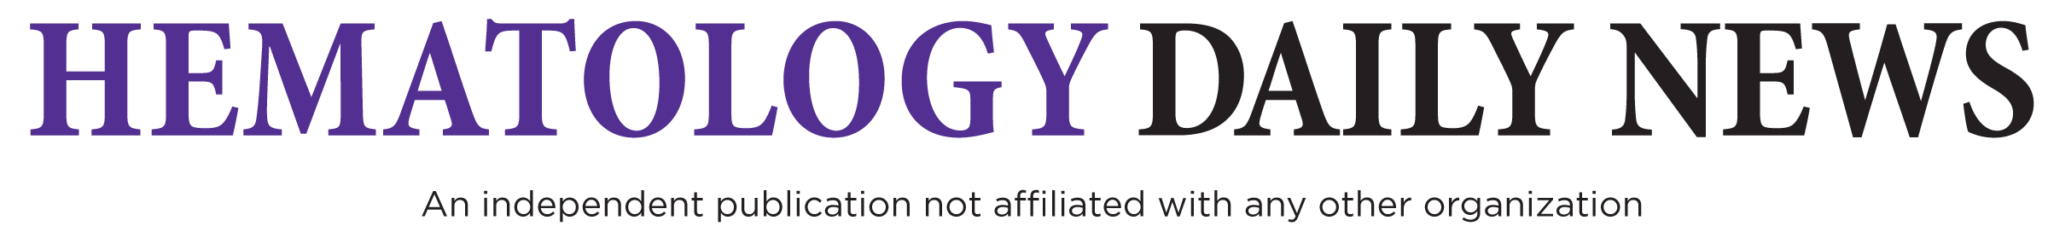 Hematology Daily News logo